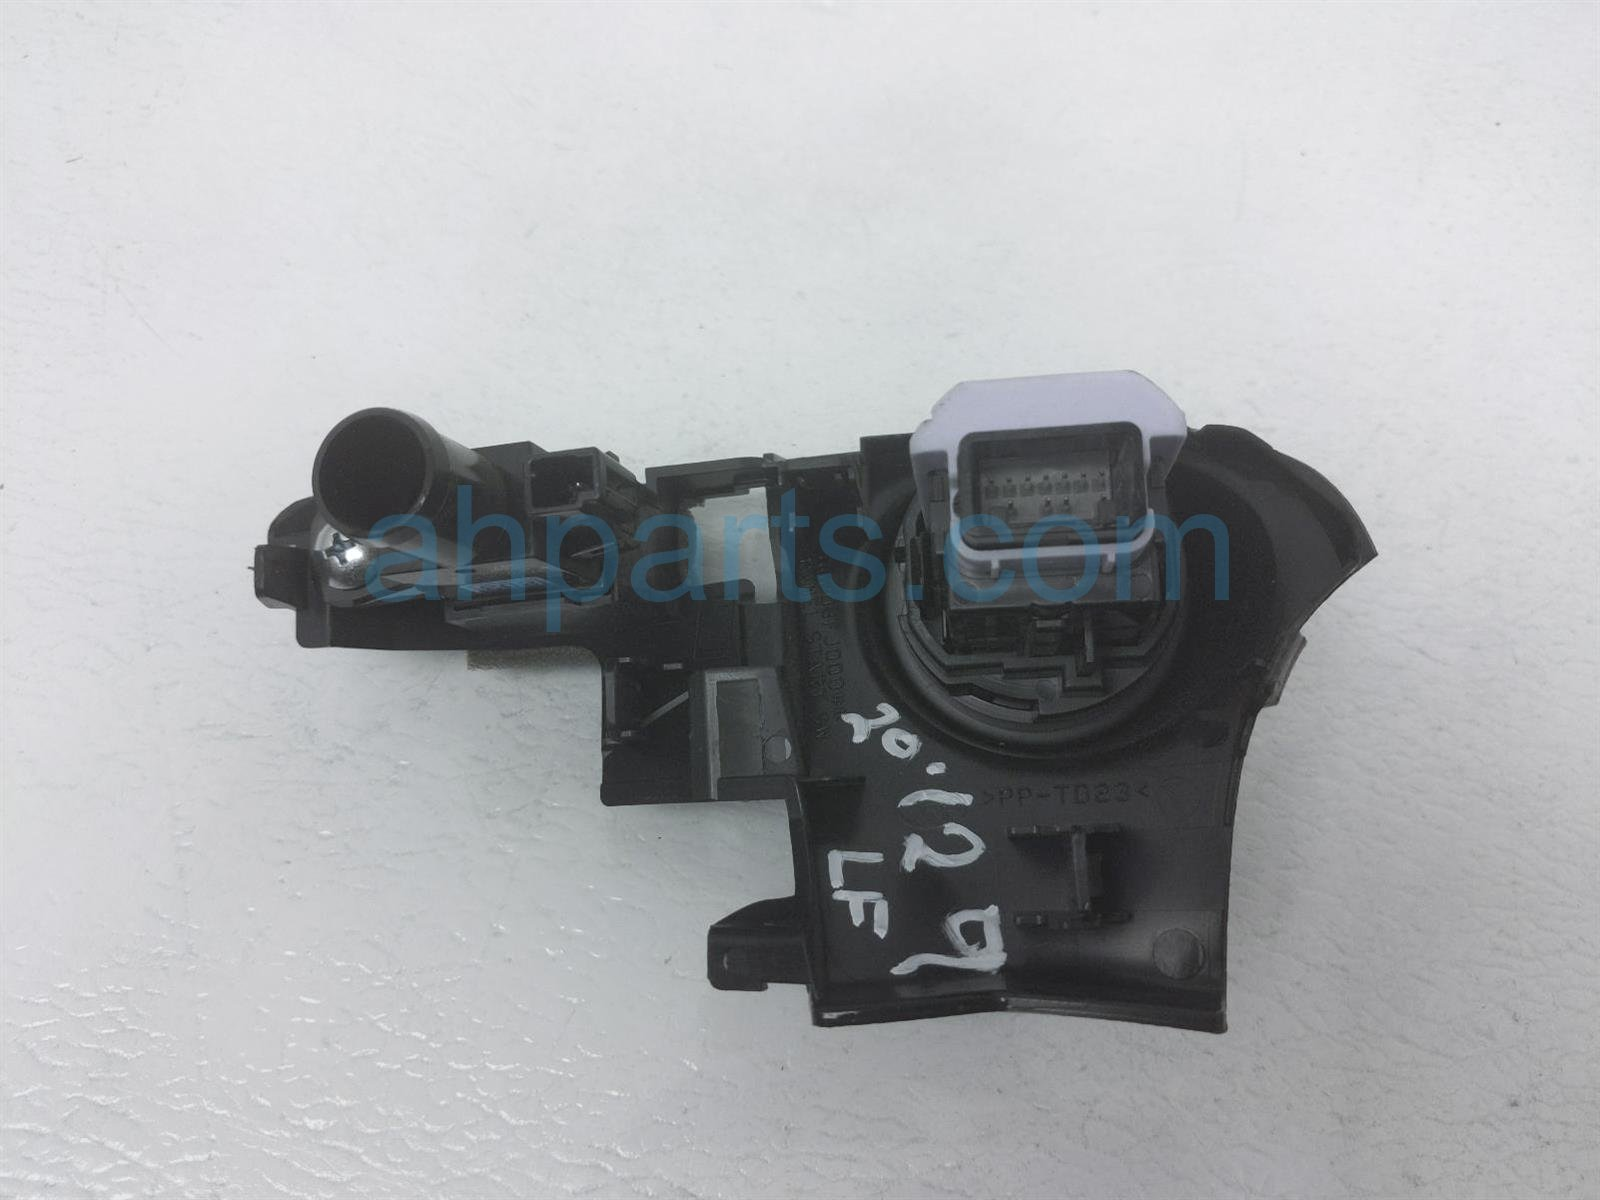 2018 Subaru WRX Column Ignition Start Stop Switch 83031FJ004 Replacement